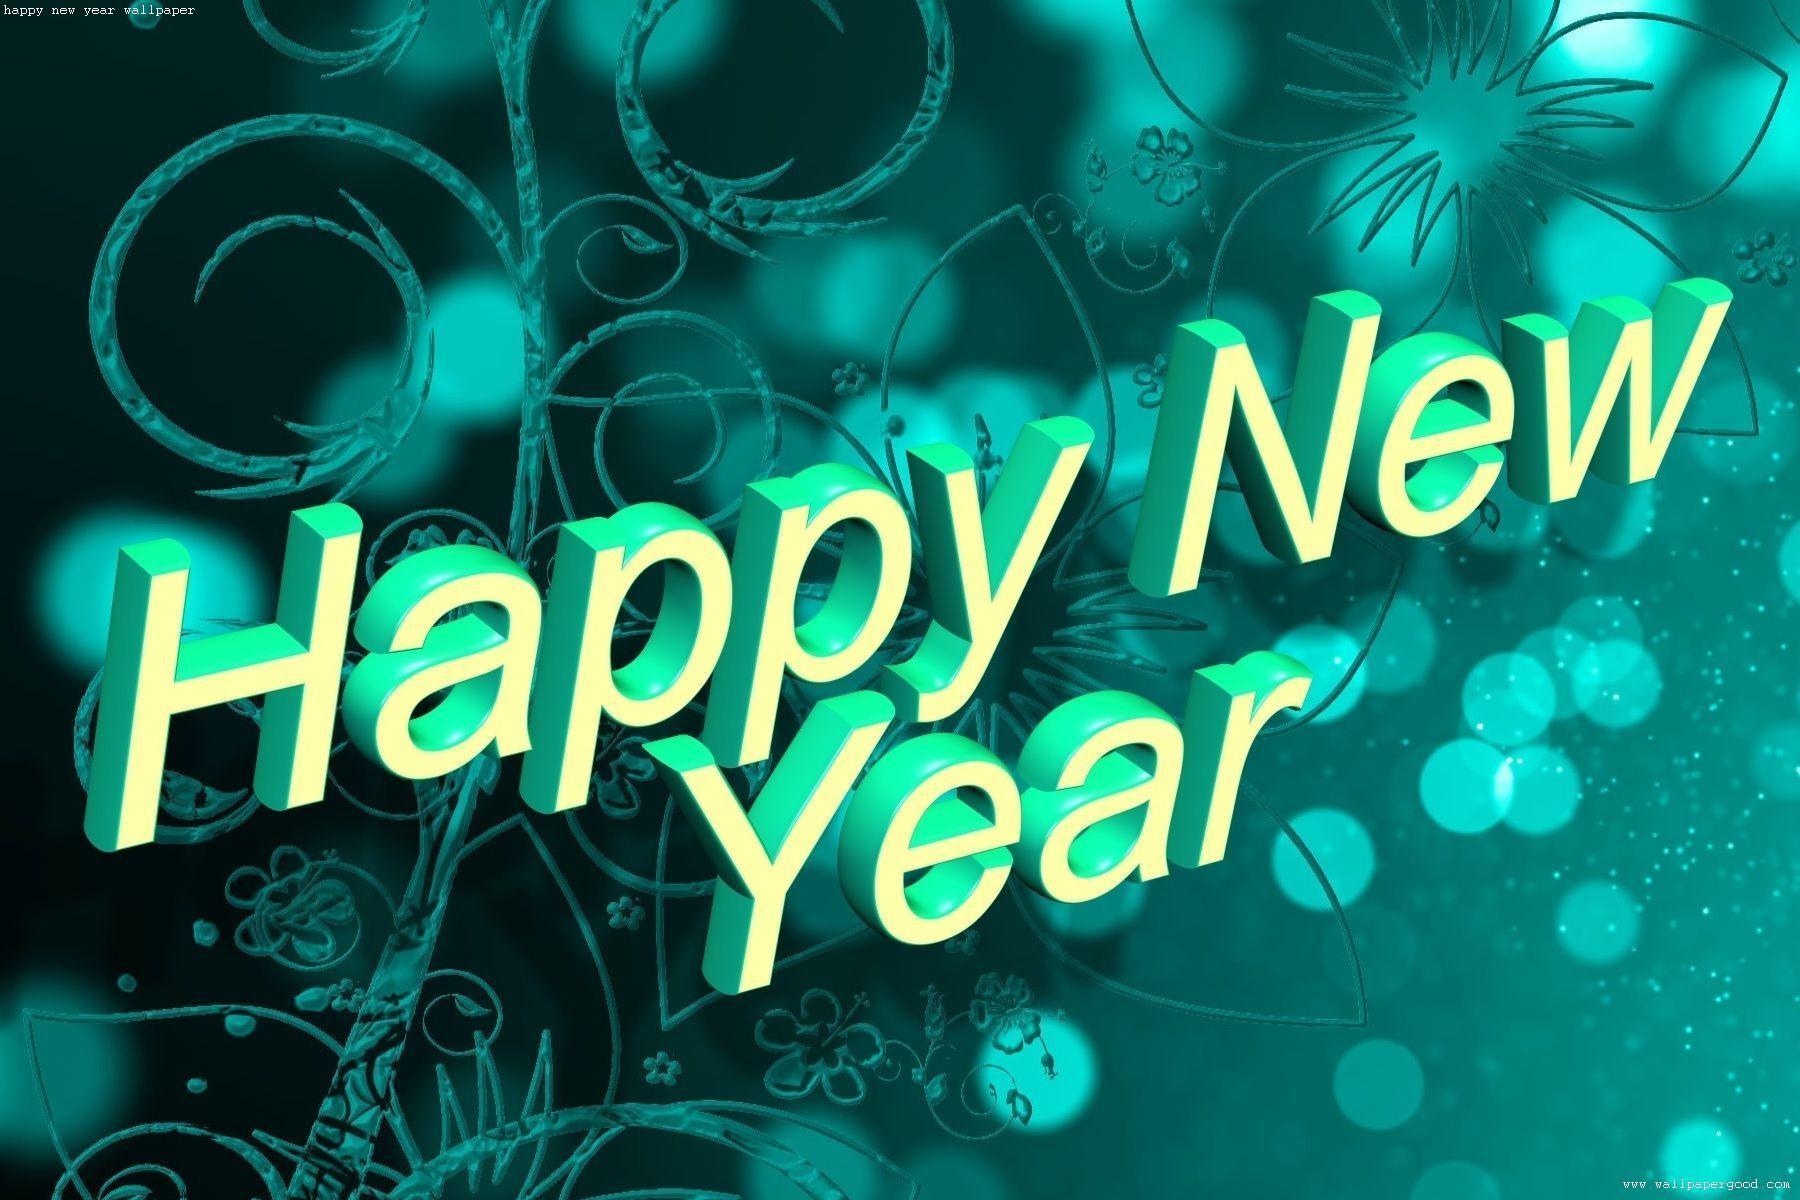 Happy New Year 2021 Wallpaper Download Happy New Year Pictures Happy New Year Images New Year Images Hd